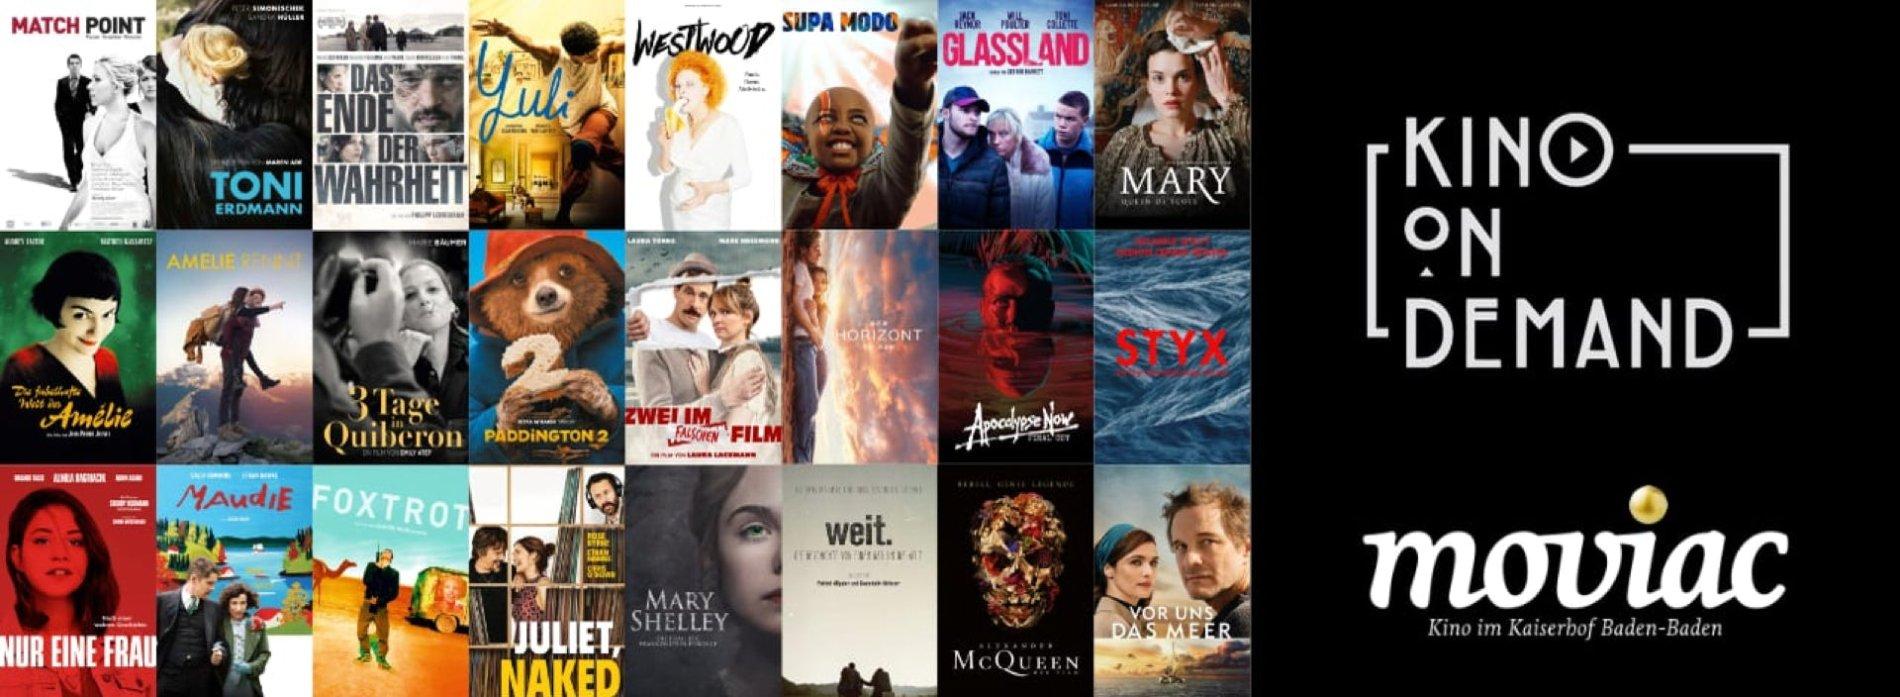 Moviac Kino on Demand